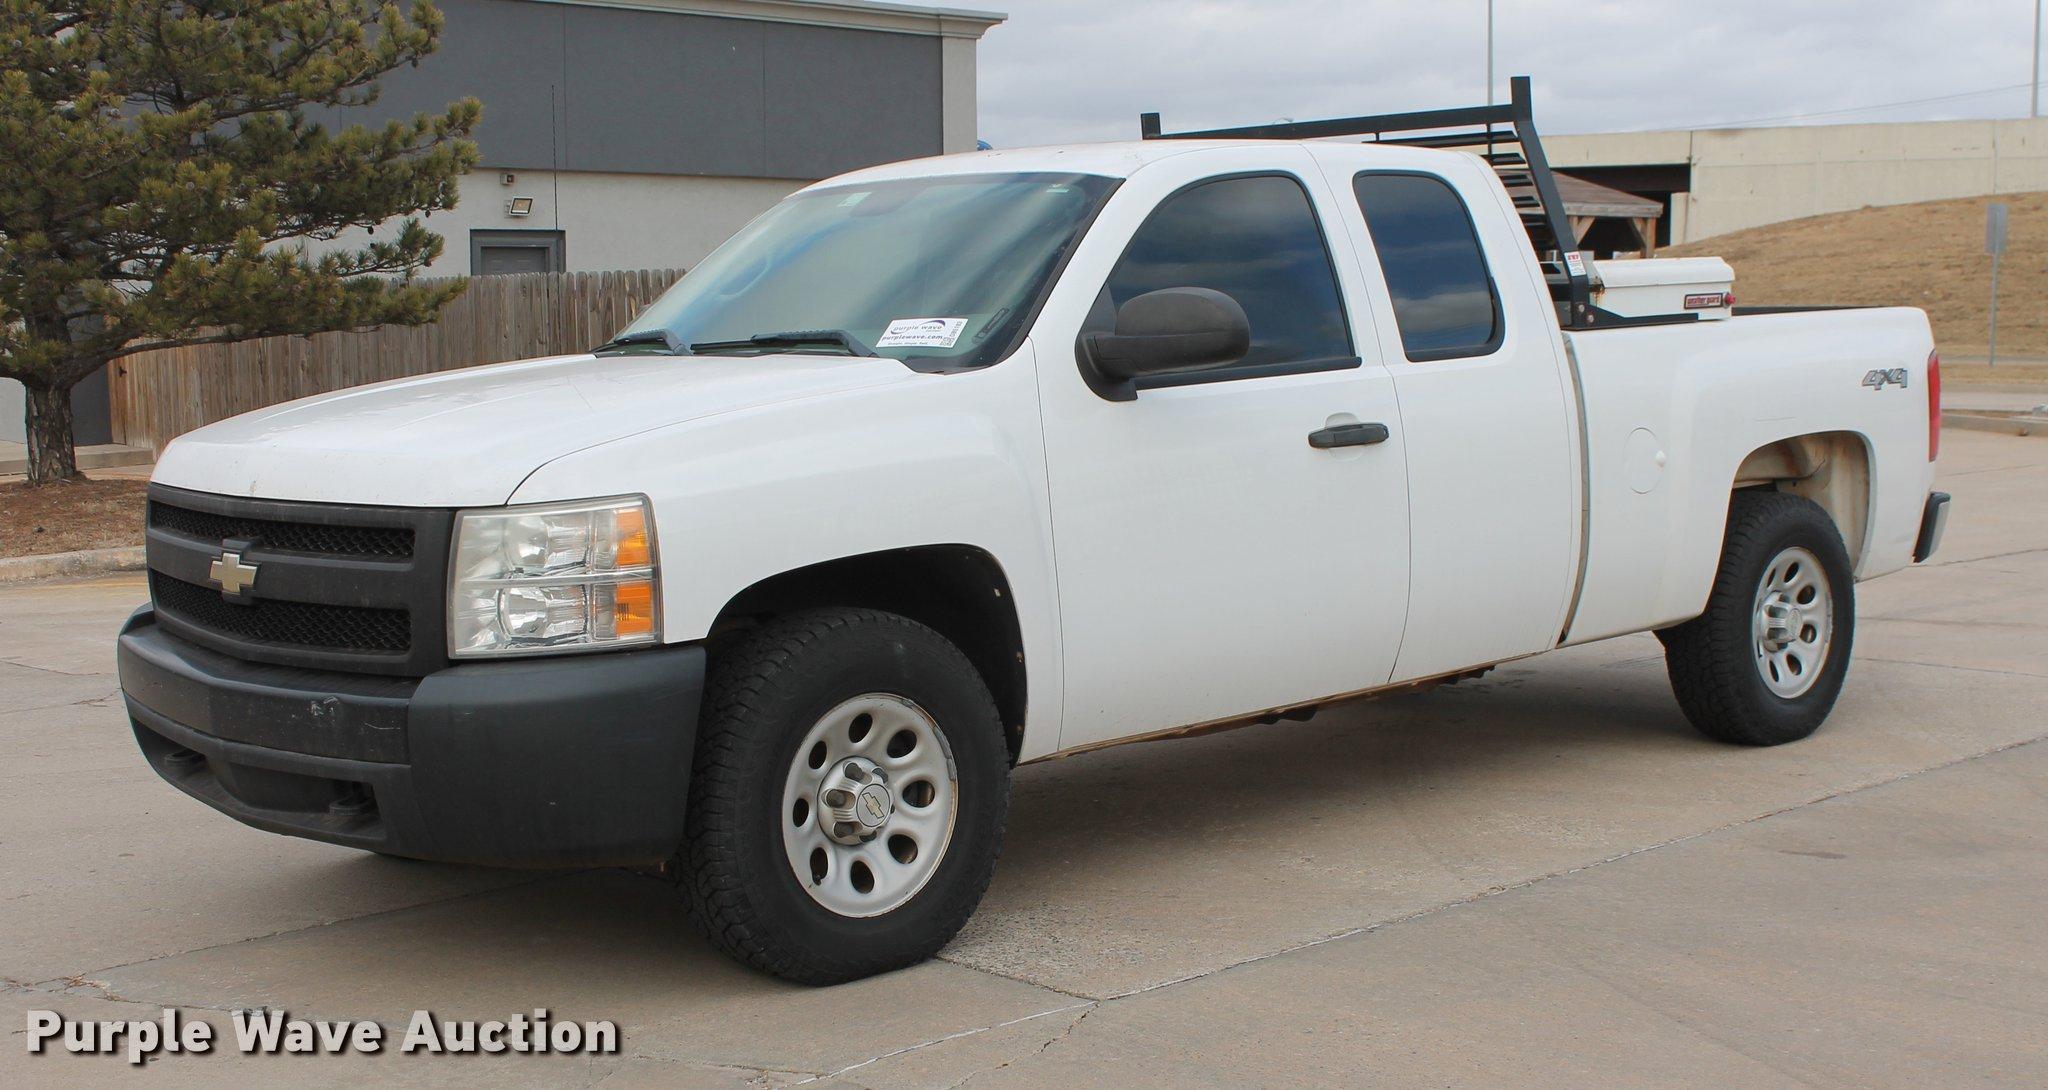 2007 Chevrolet Silverado 1500 Extended Cab >> 2007 Chevrolet Silverado 1500 Ext Cab Pickup Truck Item D